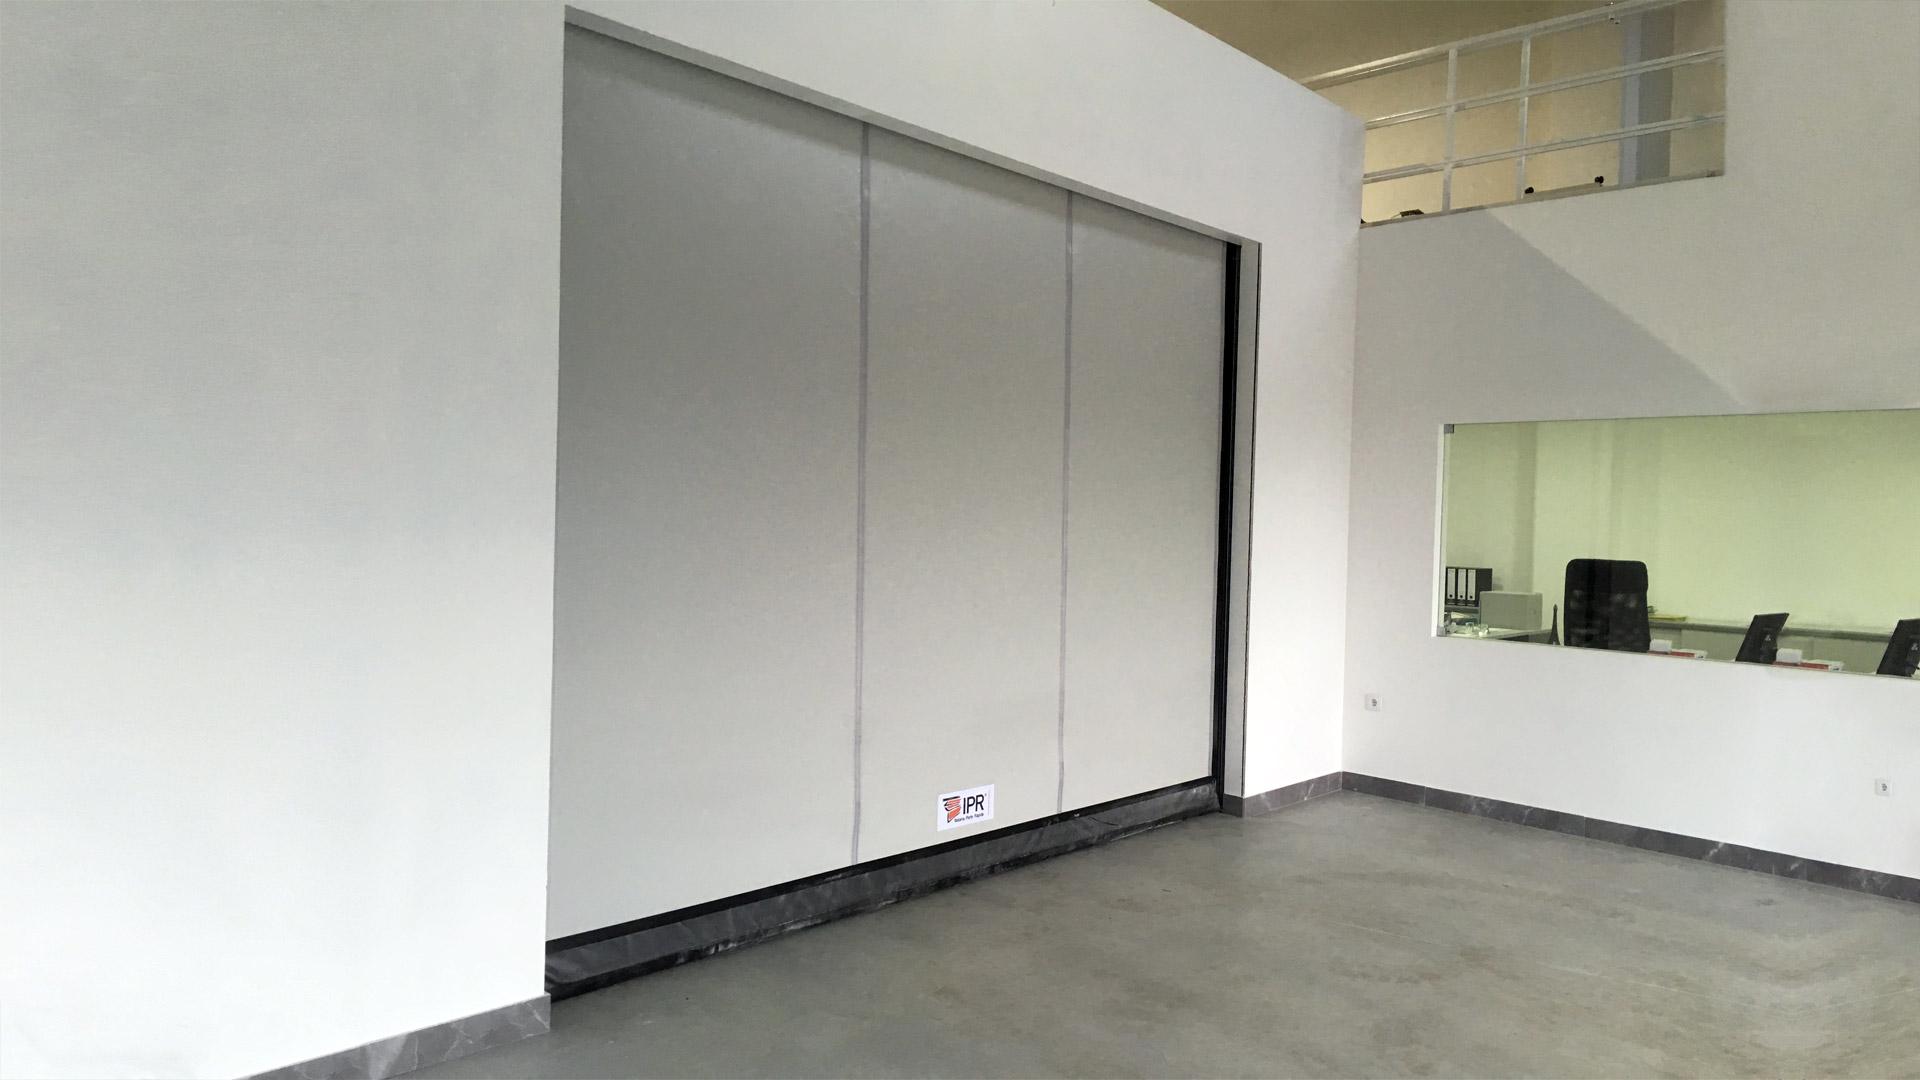 Porta rápida - FlexiRun IPR Portugal